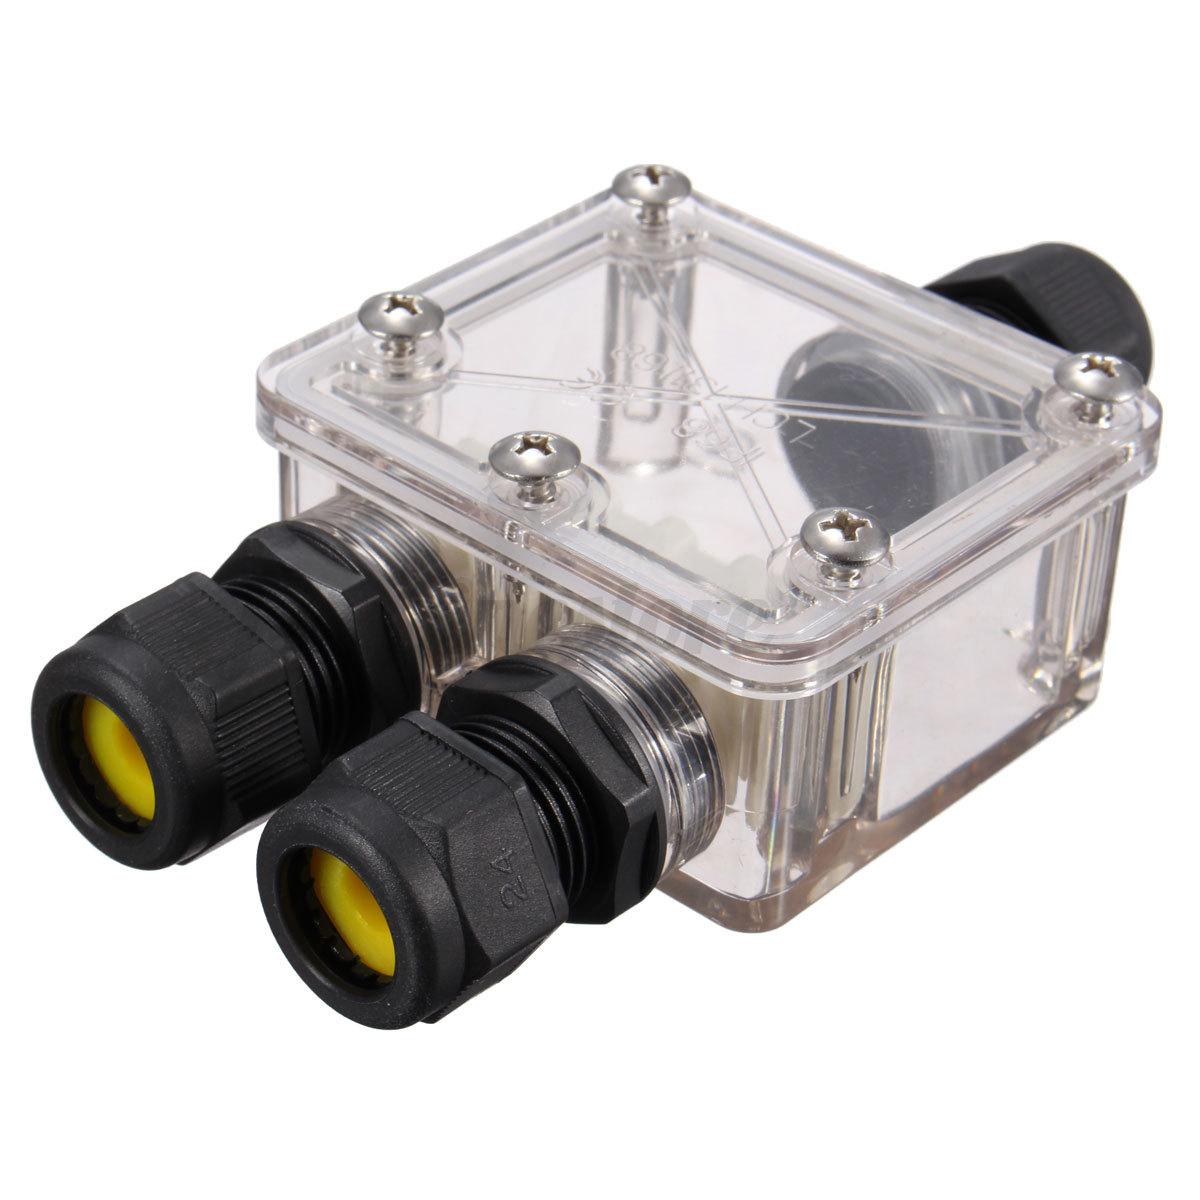 Jb004 Waterproof Junction Box Outdoor Electrical Power